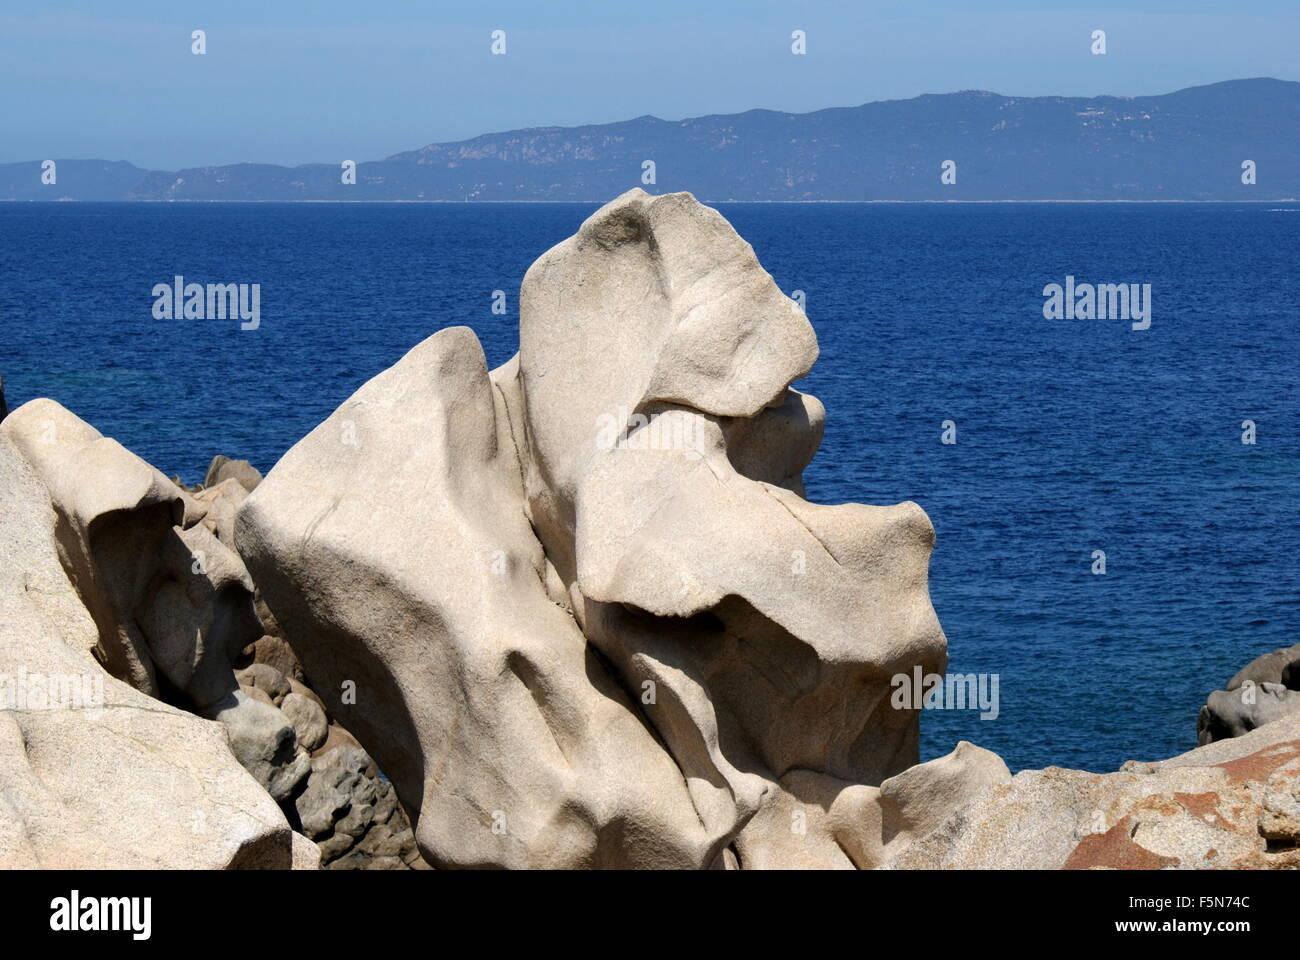 Fels-Formationen, Campomoro, Korsika, Frankreich Stockfoto